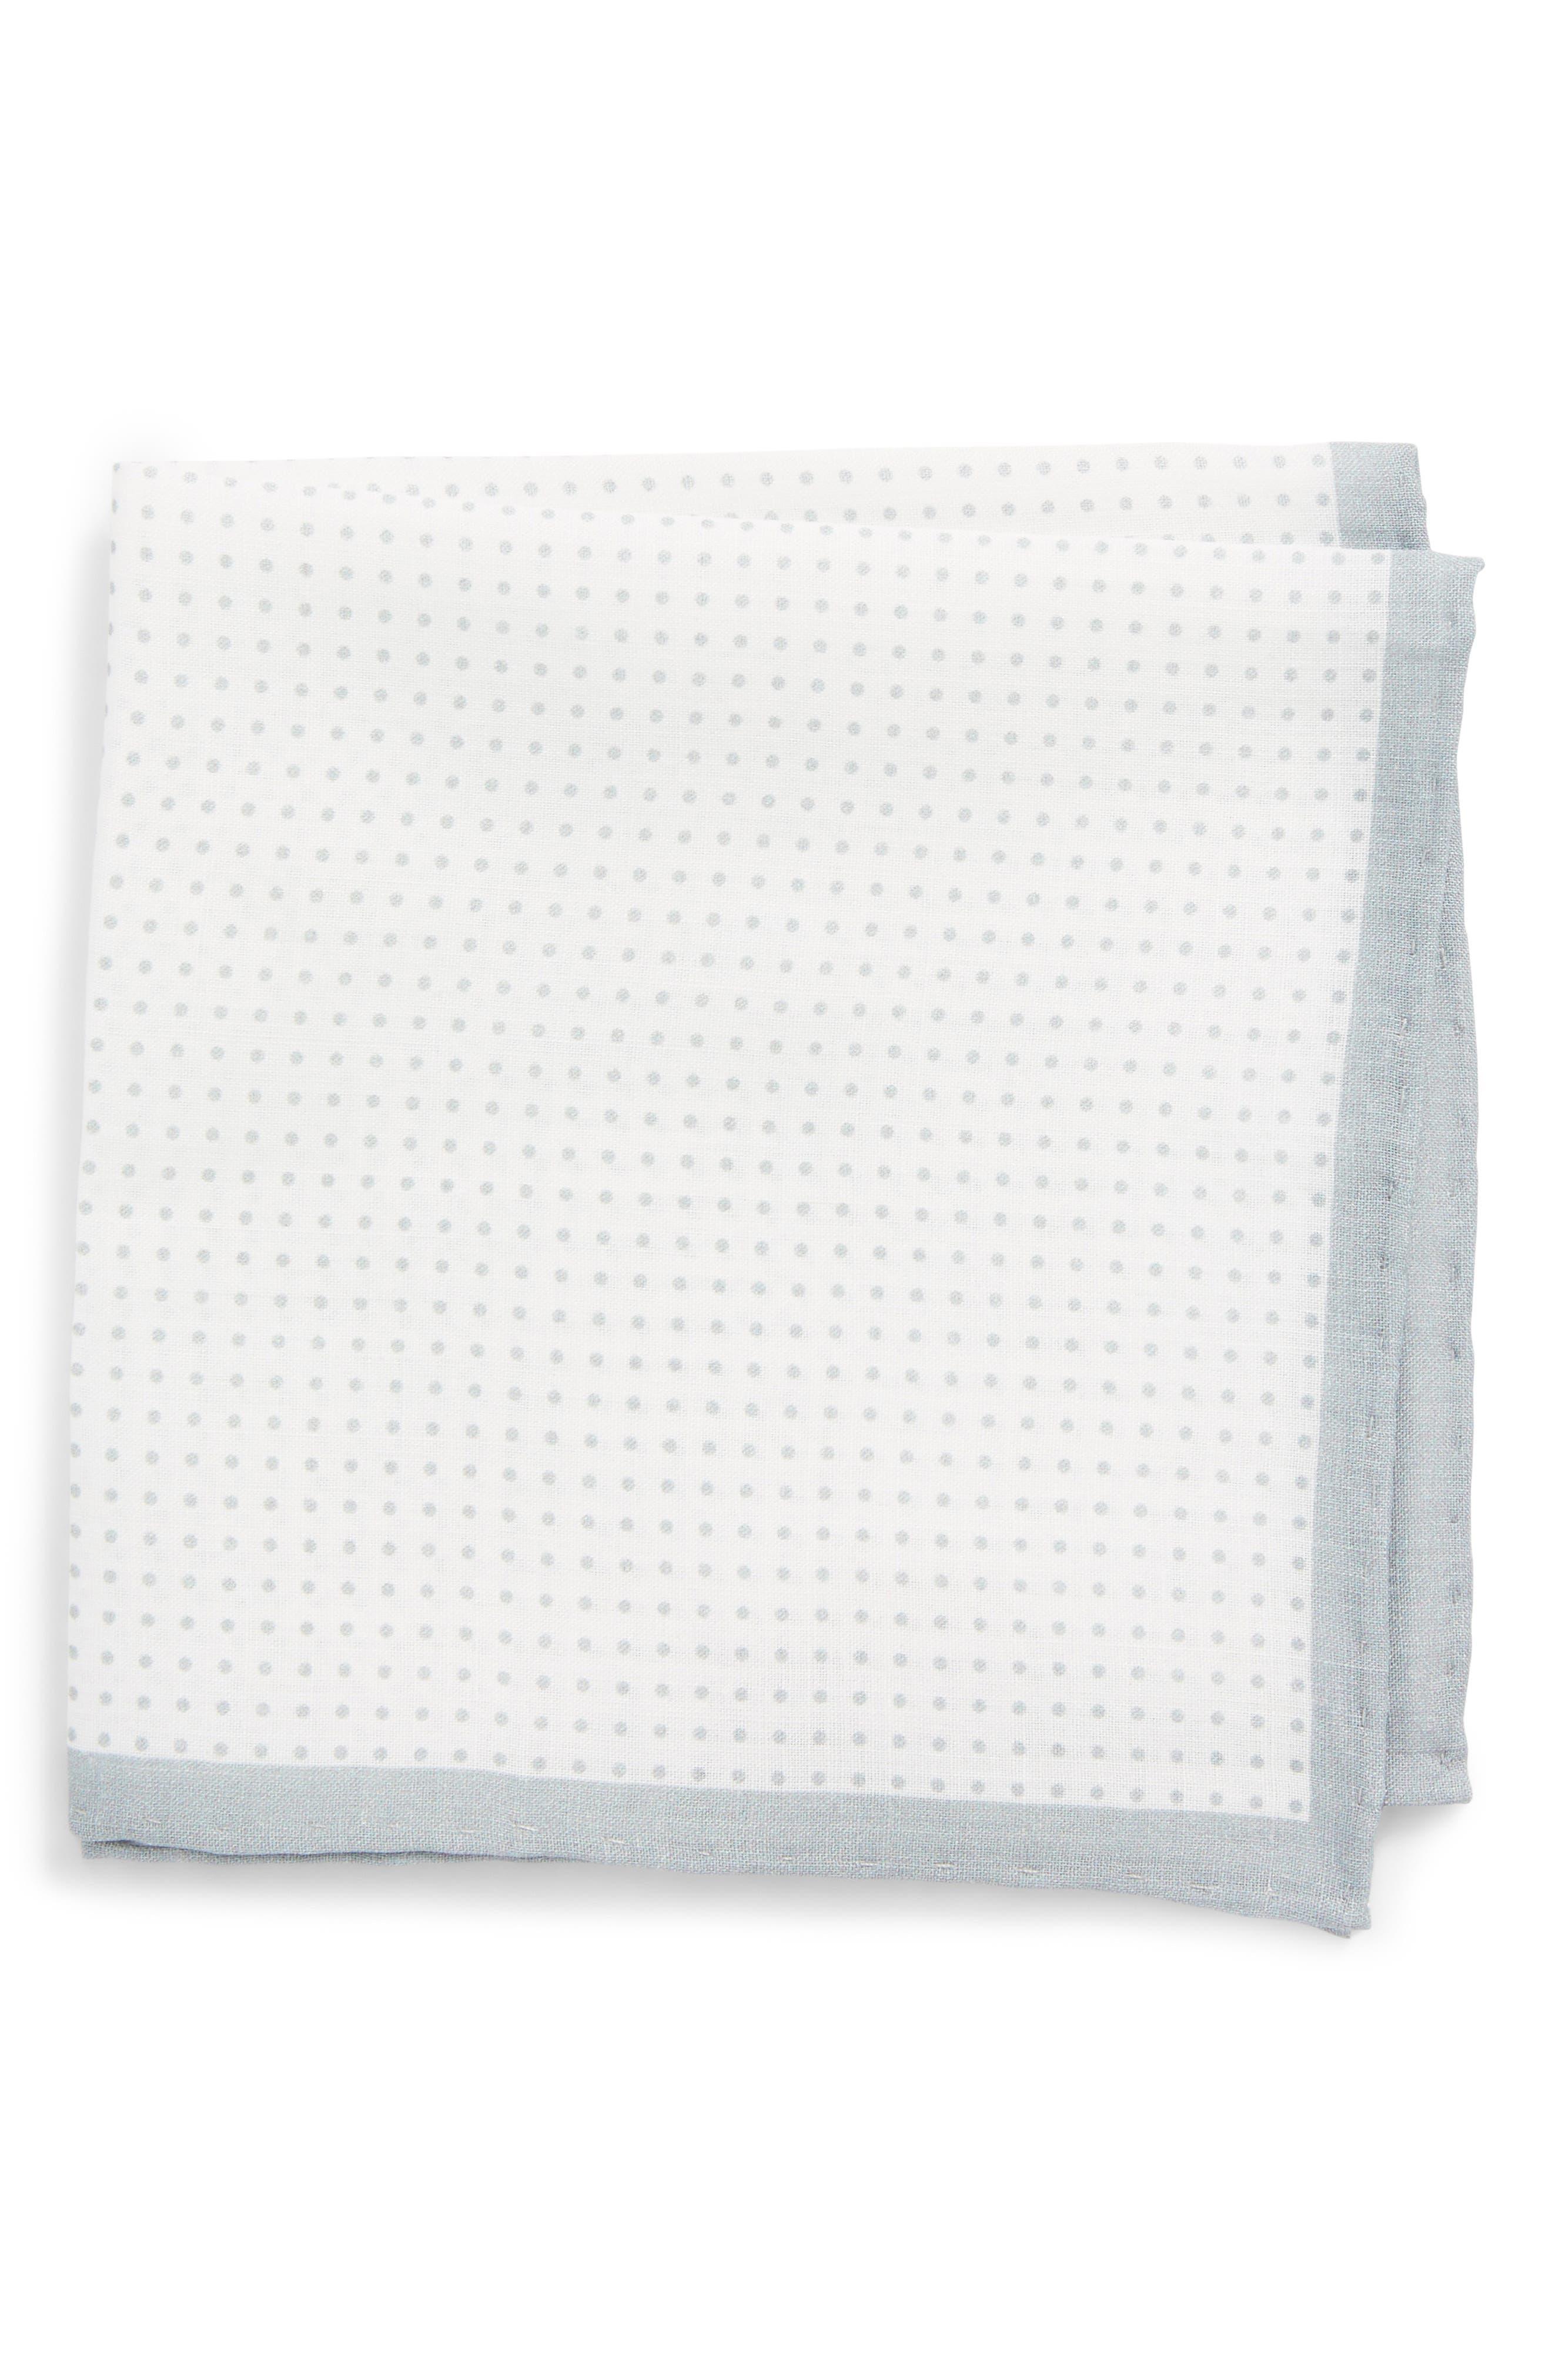 Alternate Image 1 Selected - The Tie Bar Domino Dot Linen Pocket Square